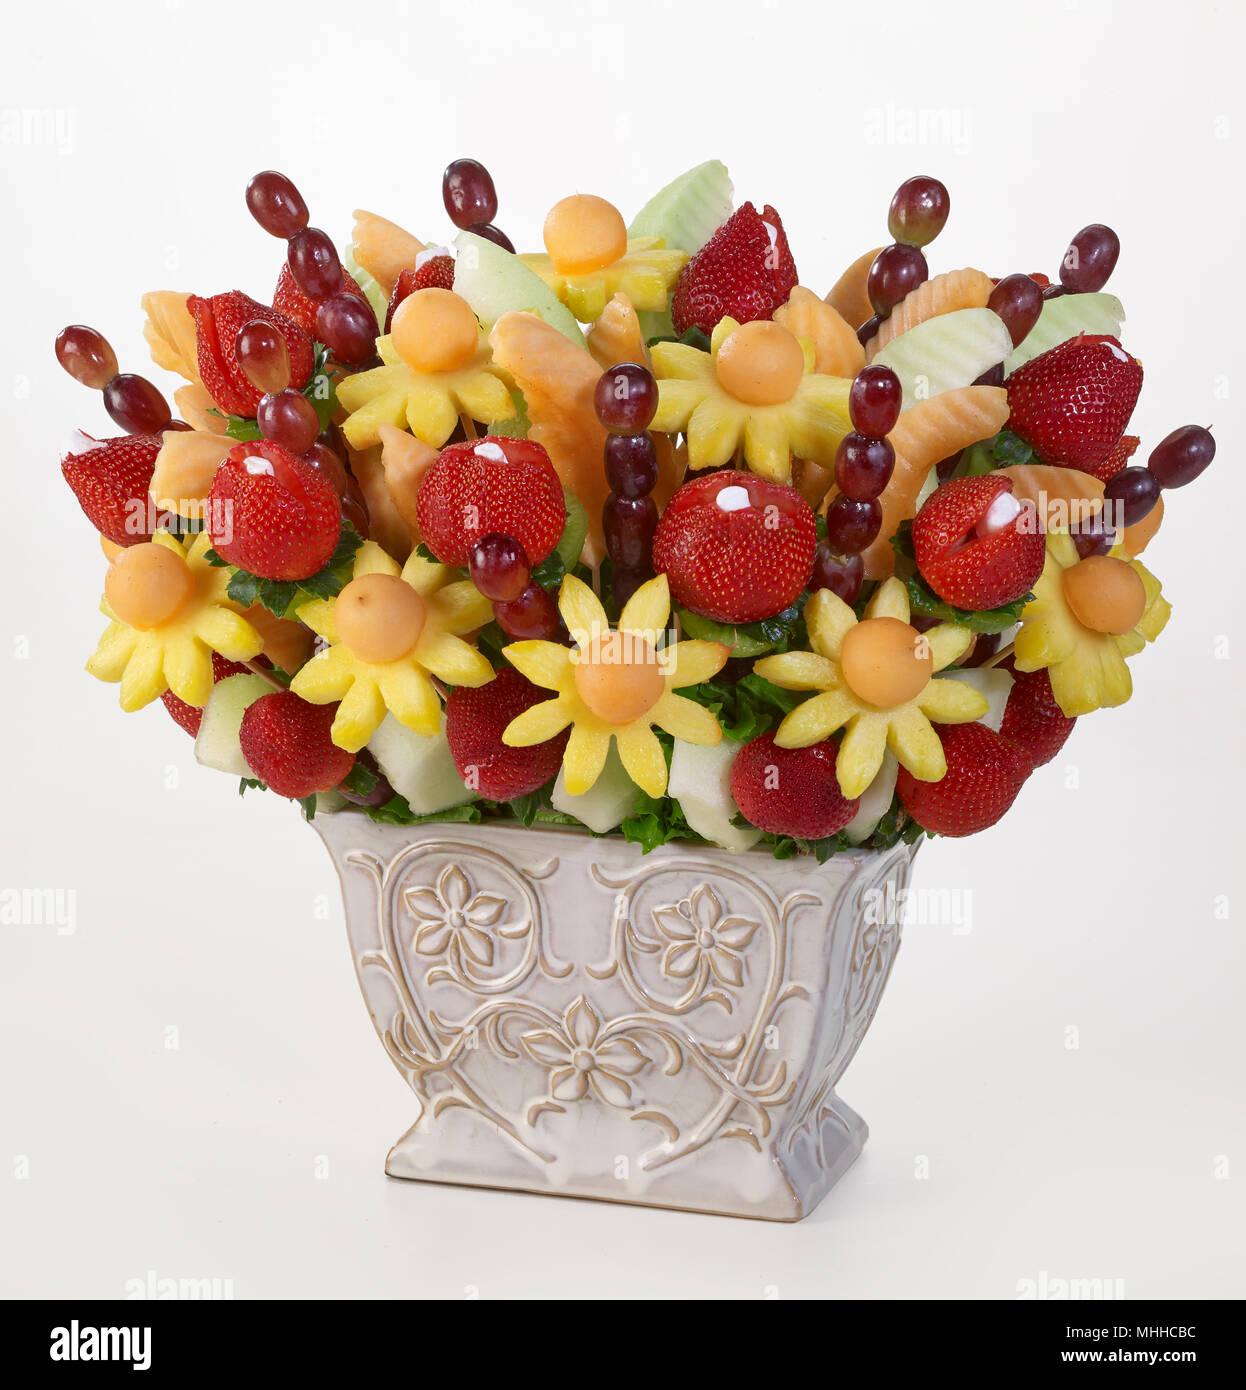 Fruit flowers bouquet stock photo 182935744 alamy fruit flowers bouquet izmirmasajfo